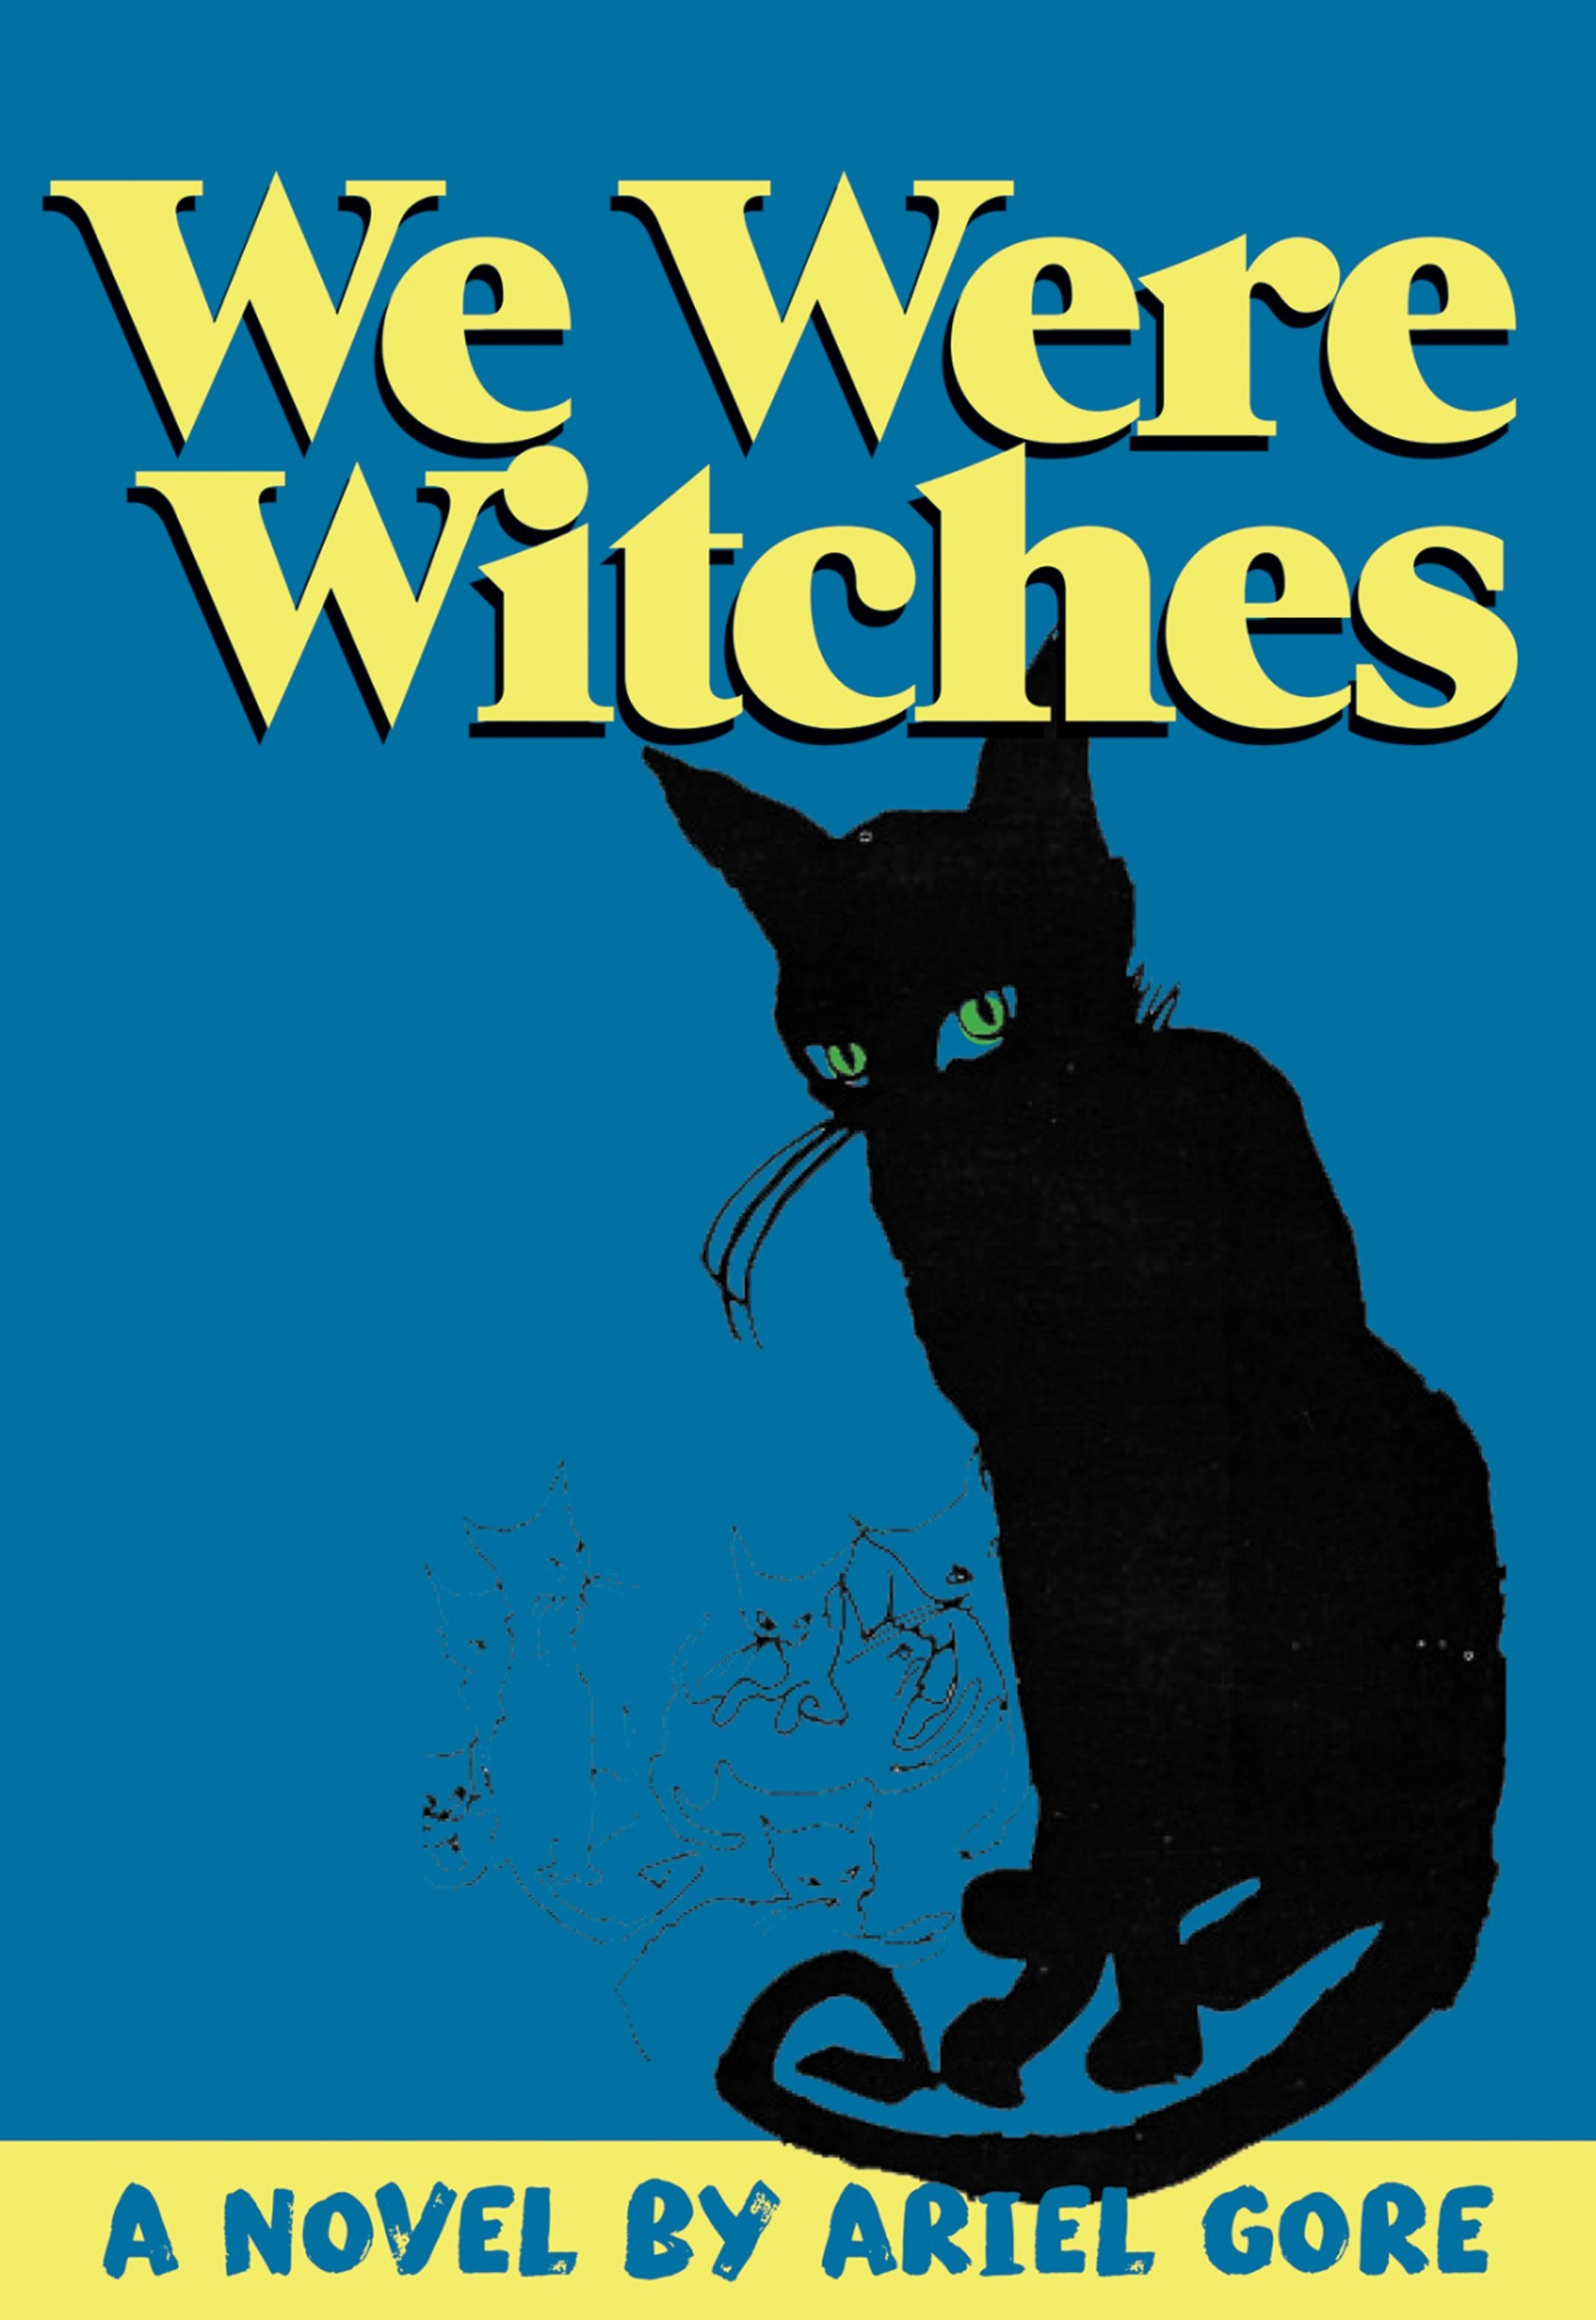 Amazon.com: We Were Witches (9781558614338): Ariel Gore: Books